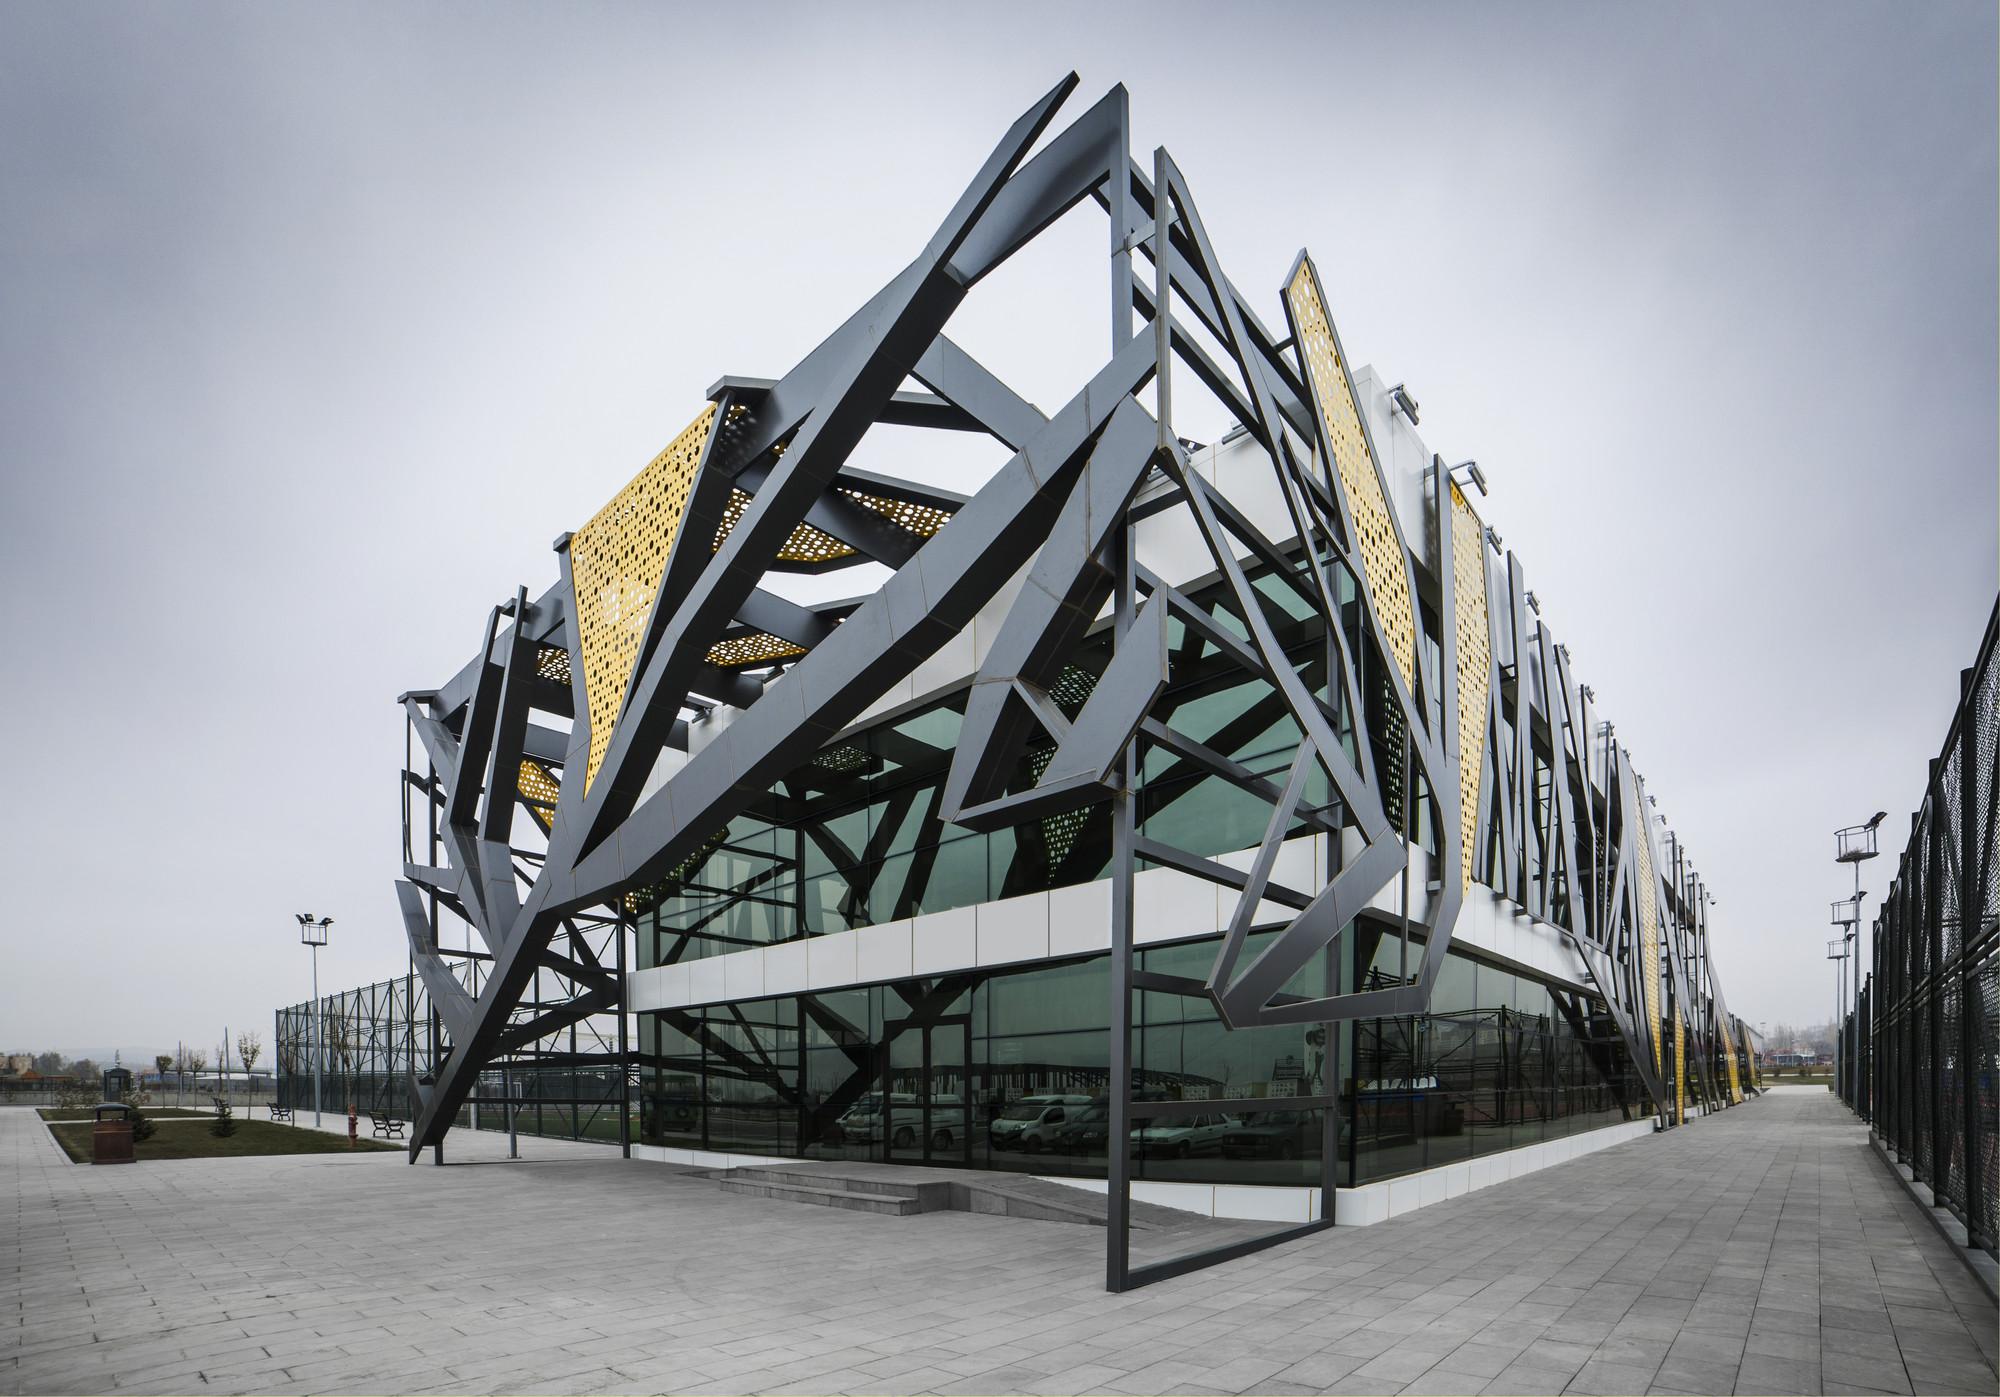 Open Courts Sports Complex / BKA-Bahadır Kul Architects, © Ket Kolektif